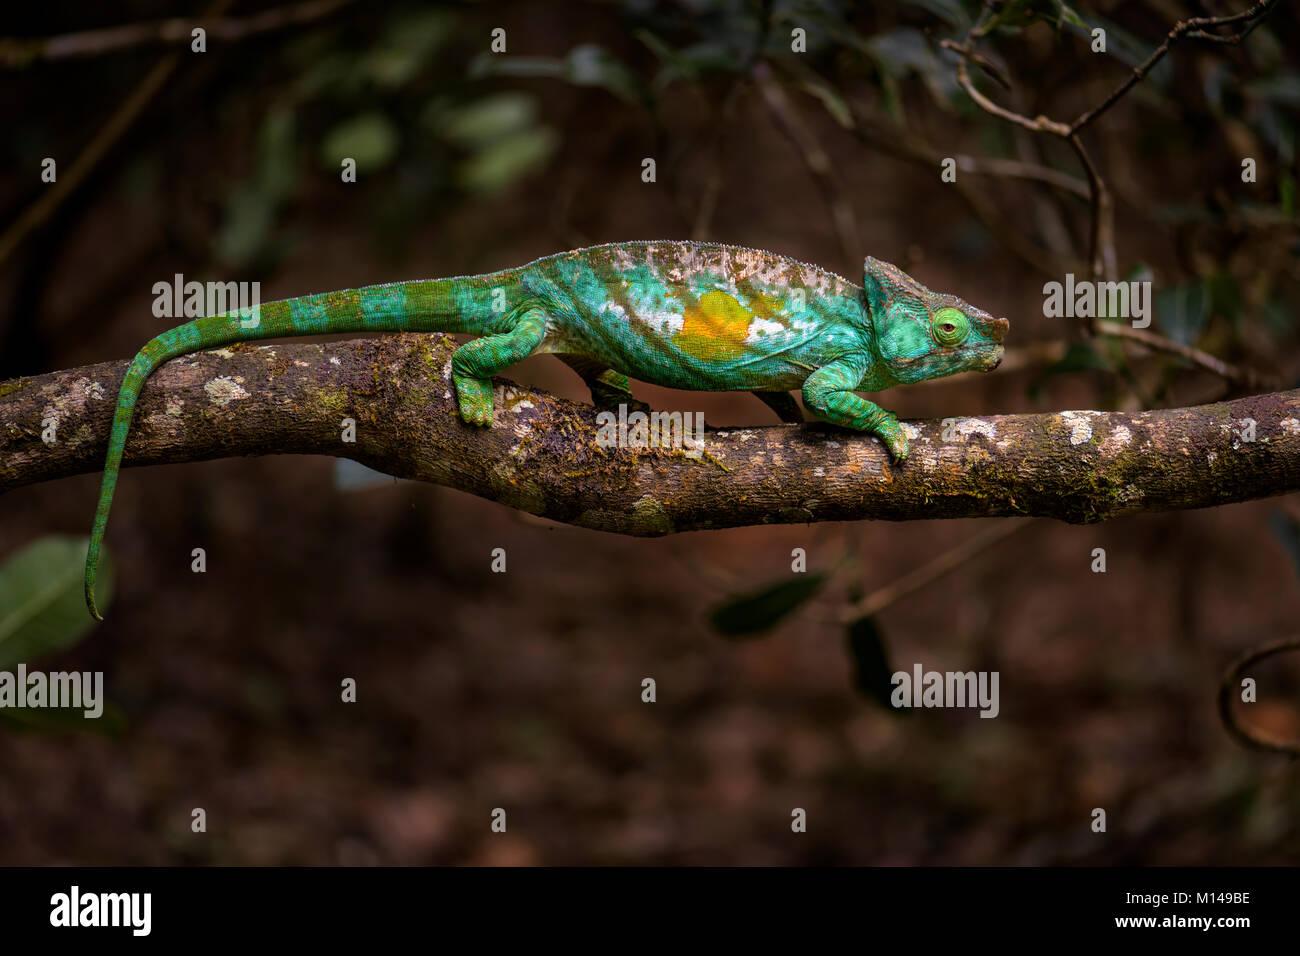 Parson's Chameleon - Calumma parsonii, bosque lluvioso la costa oriental de Madagascar. Colorida lagartija endémica. Imagen De Stock